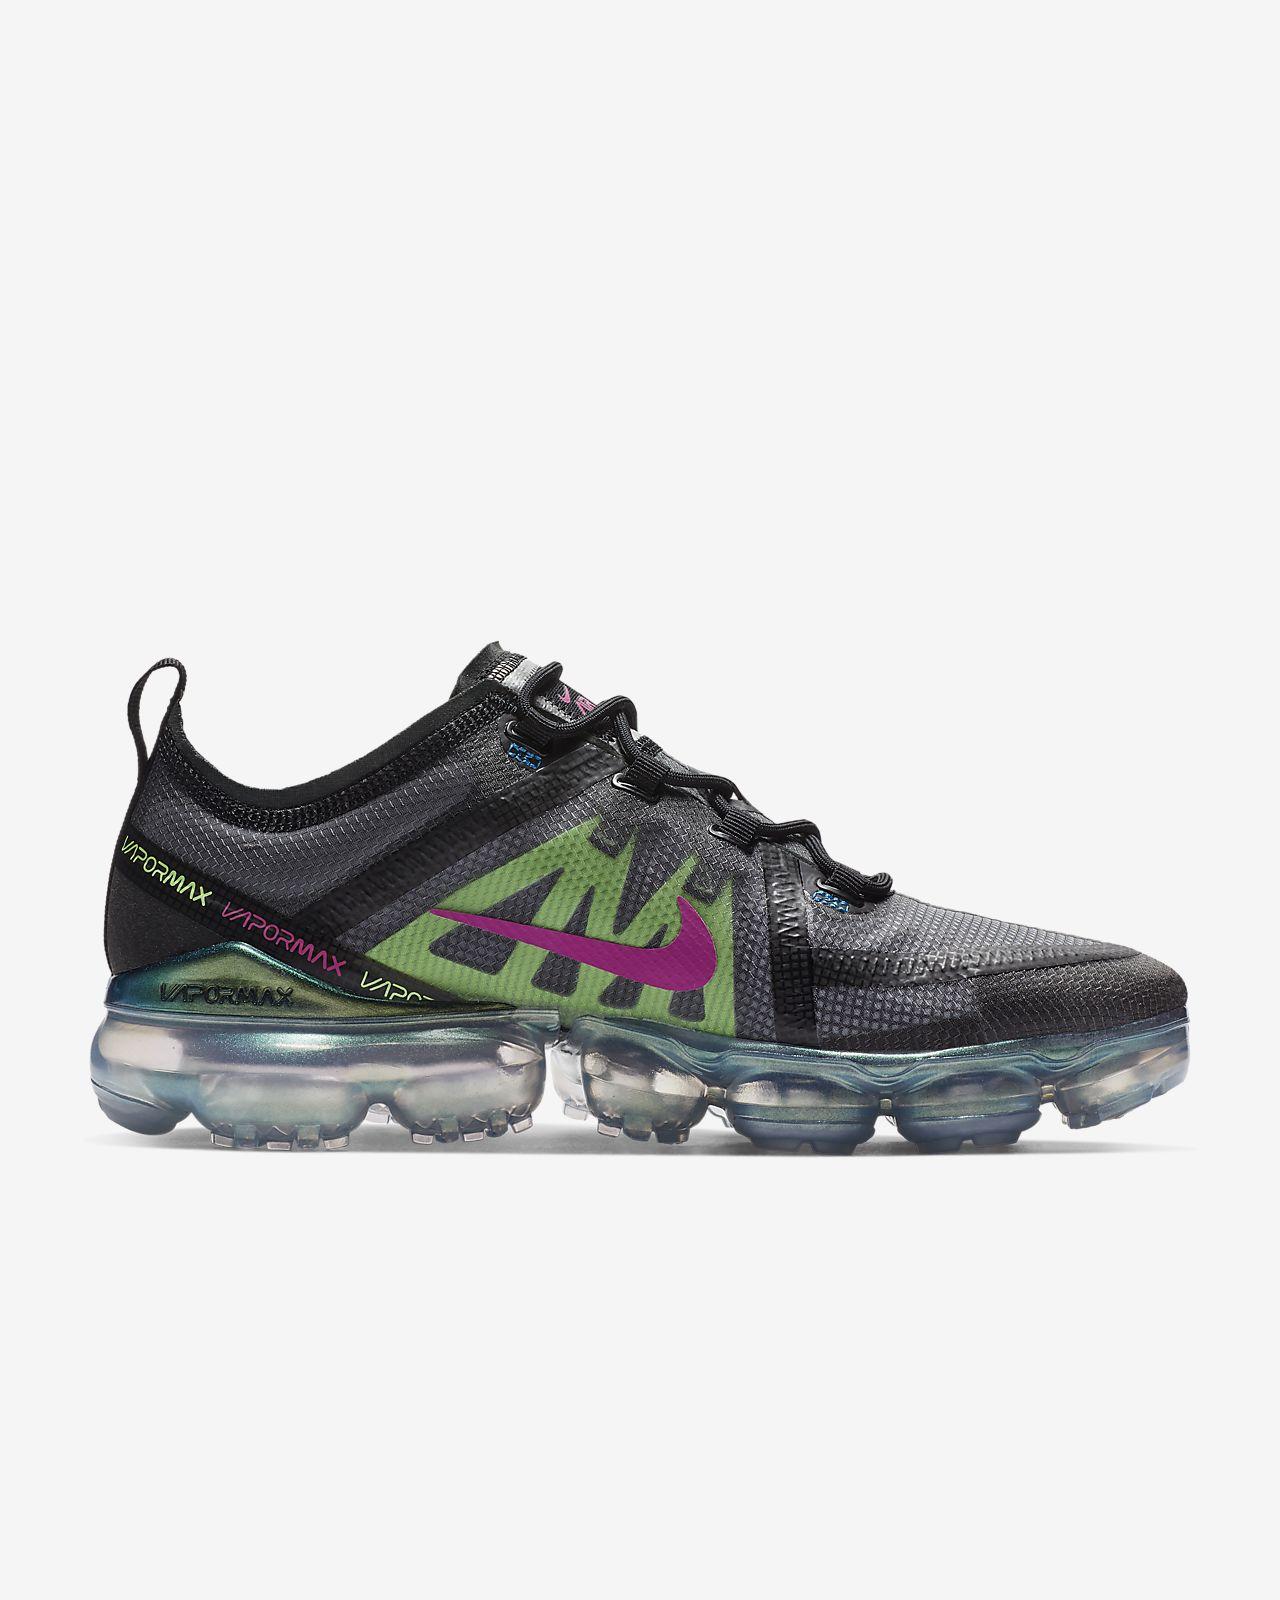 9cc7aa30792 Nike Air VaporMax 2019 Premium Shoe. Nike.com SG